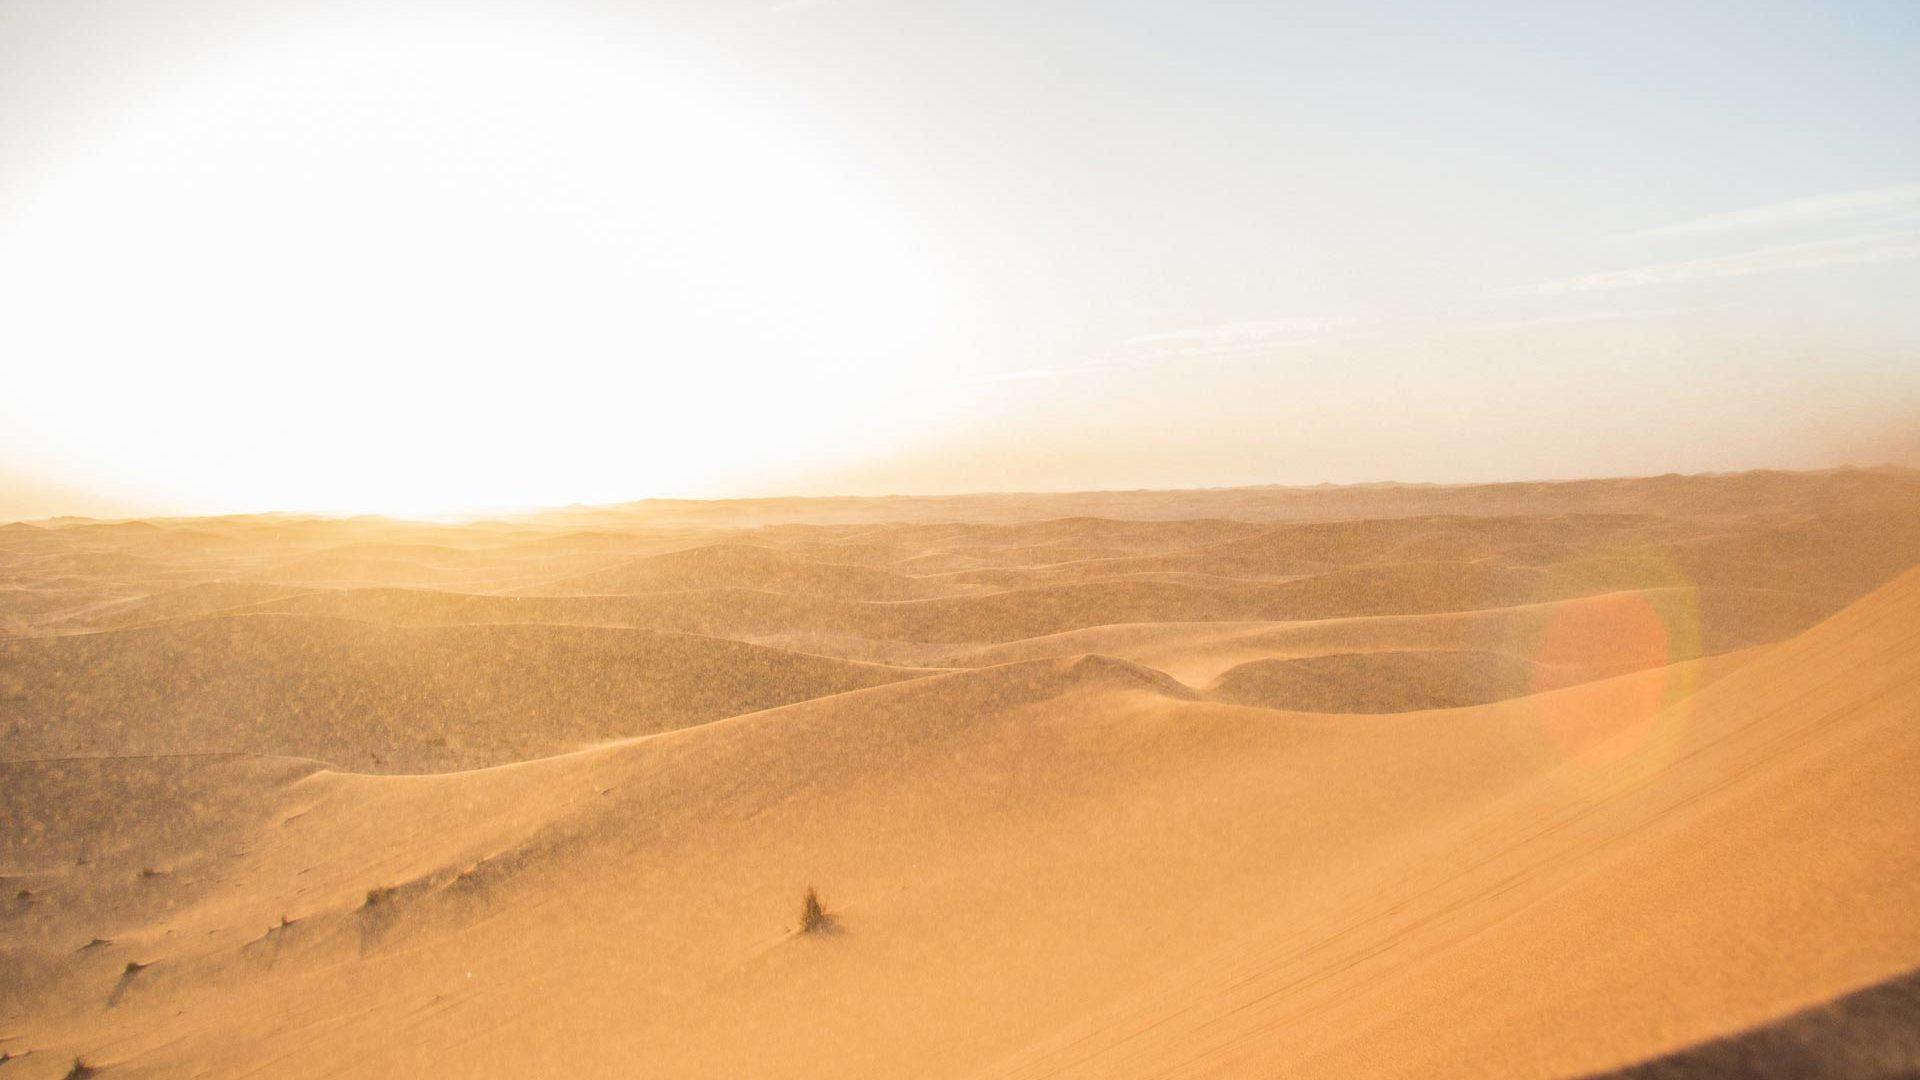 Acampar-no-deserto-do-Saara-54